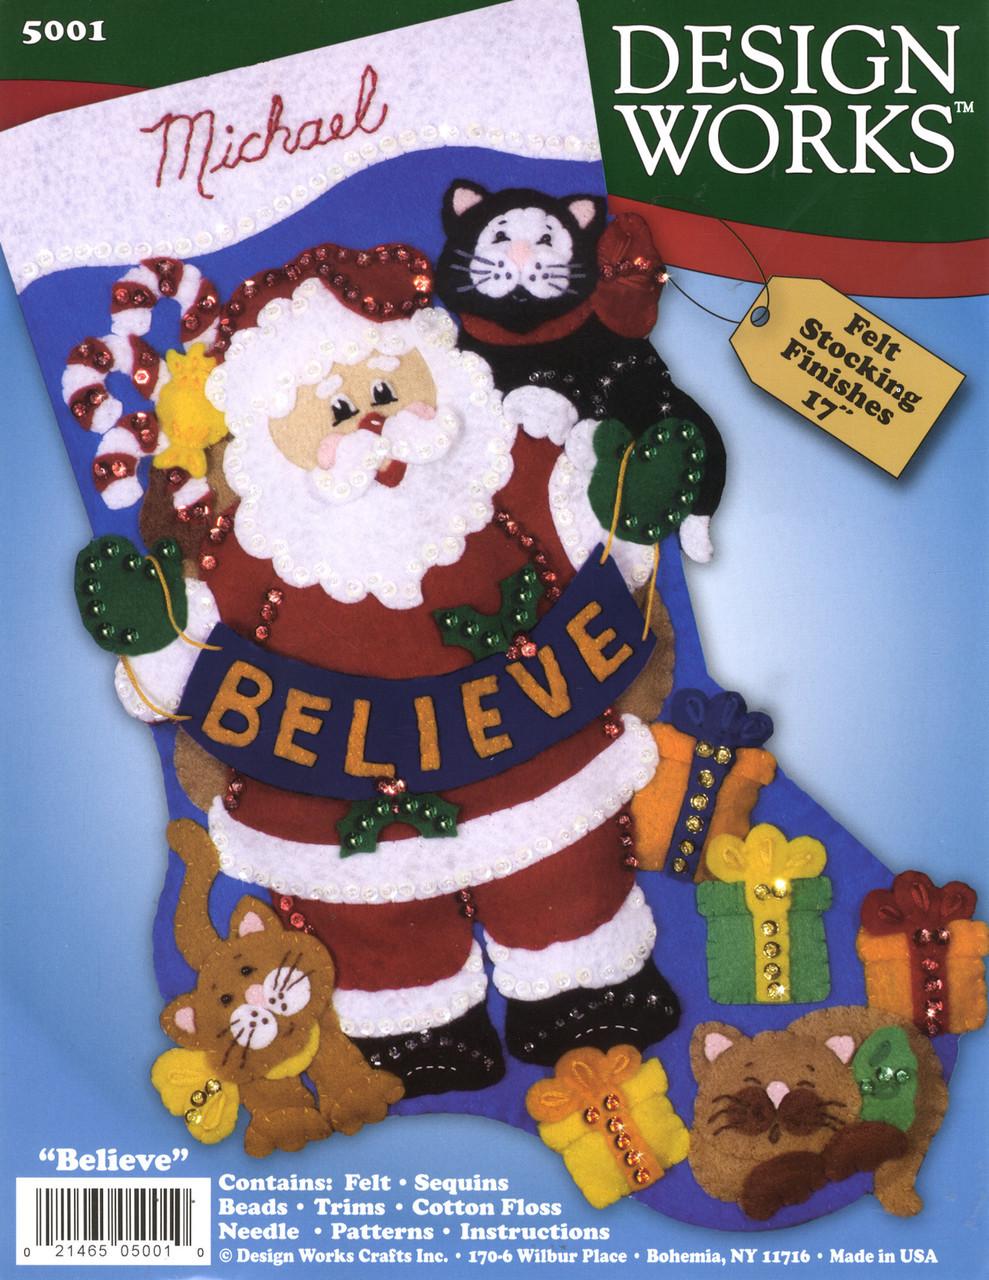 Design Works - Believe Stocking